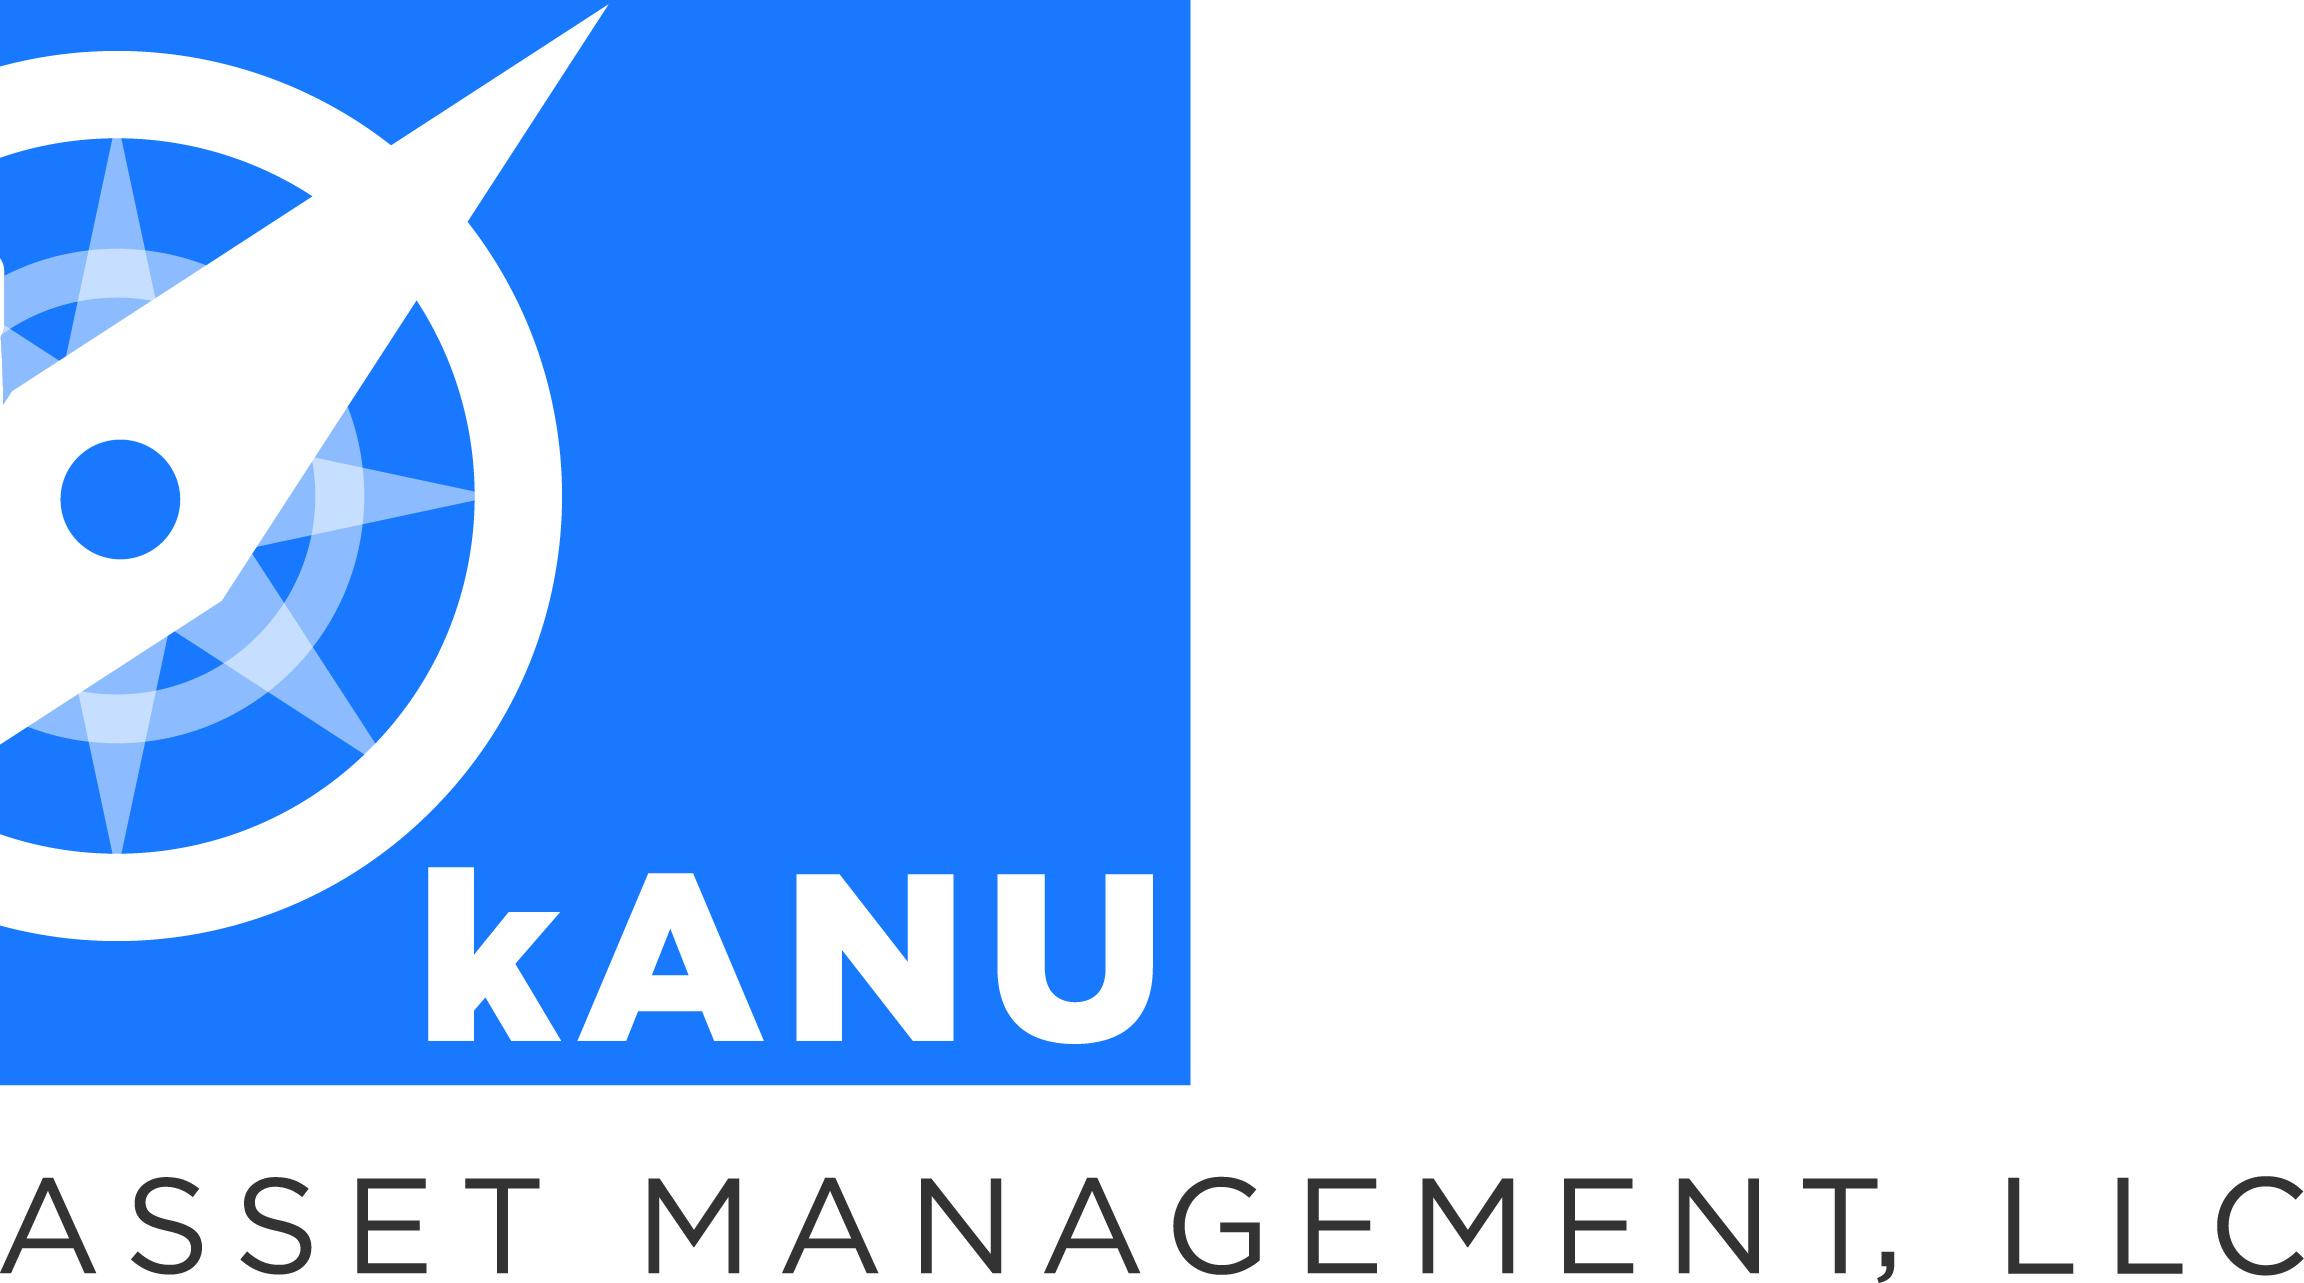 kANU Asset Managementllc